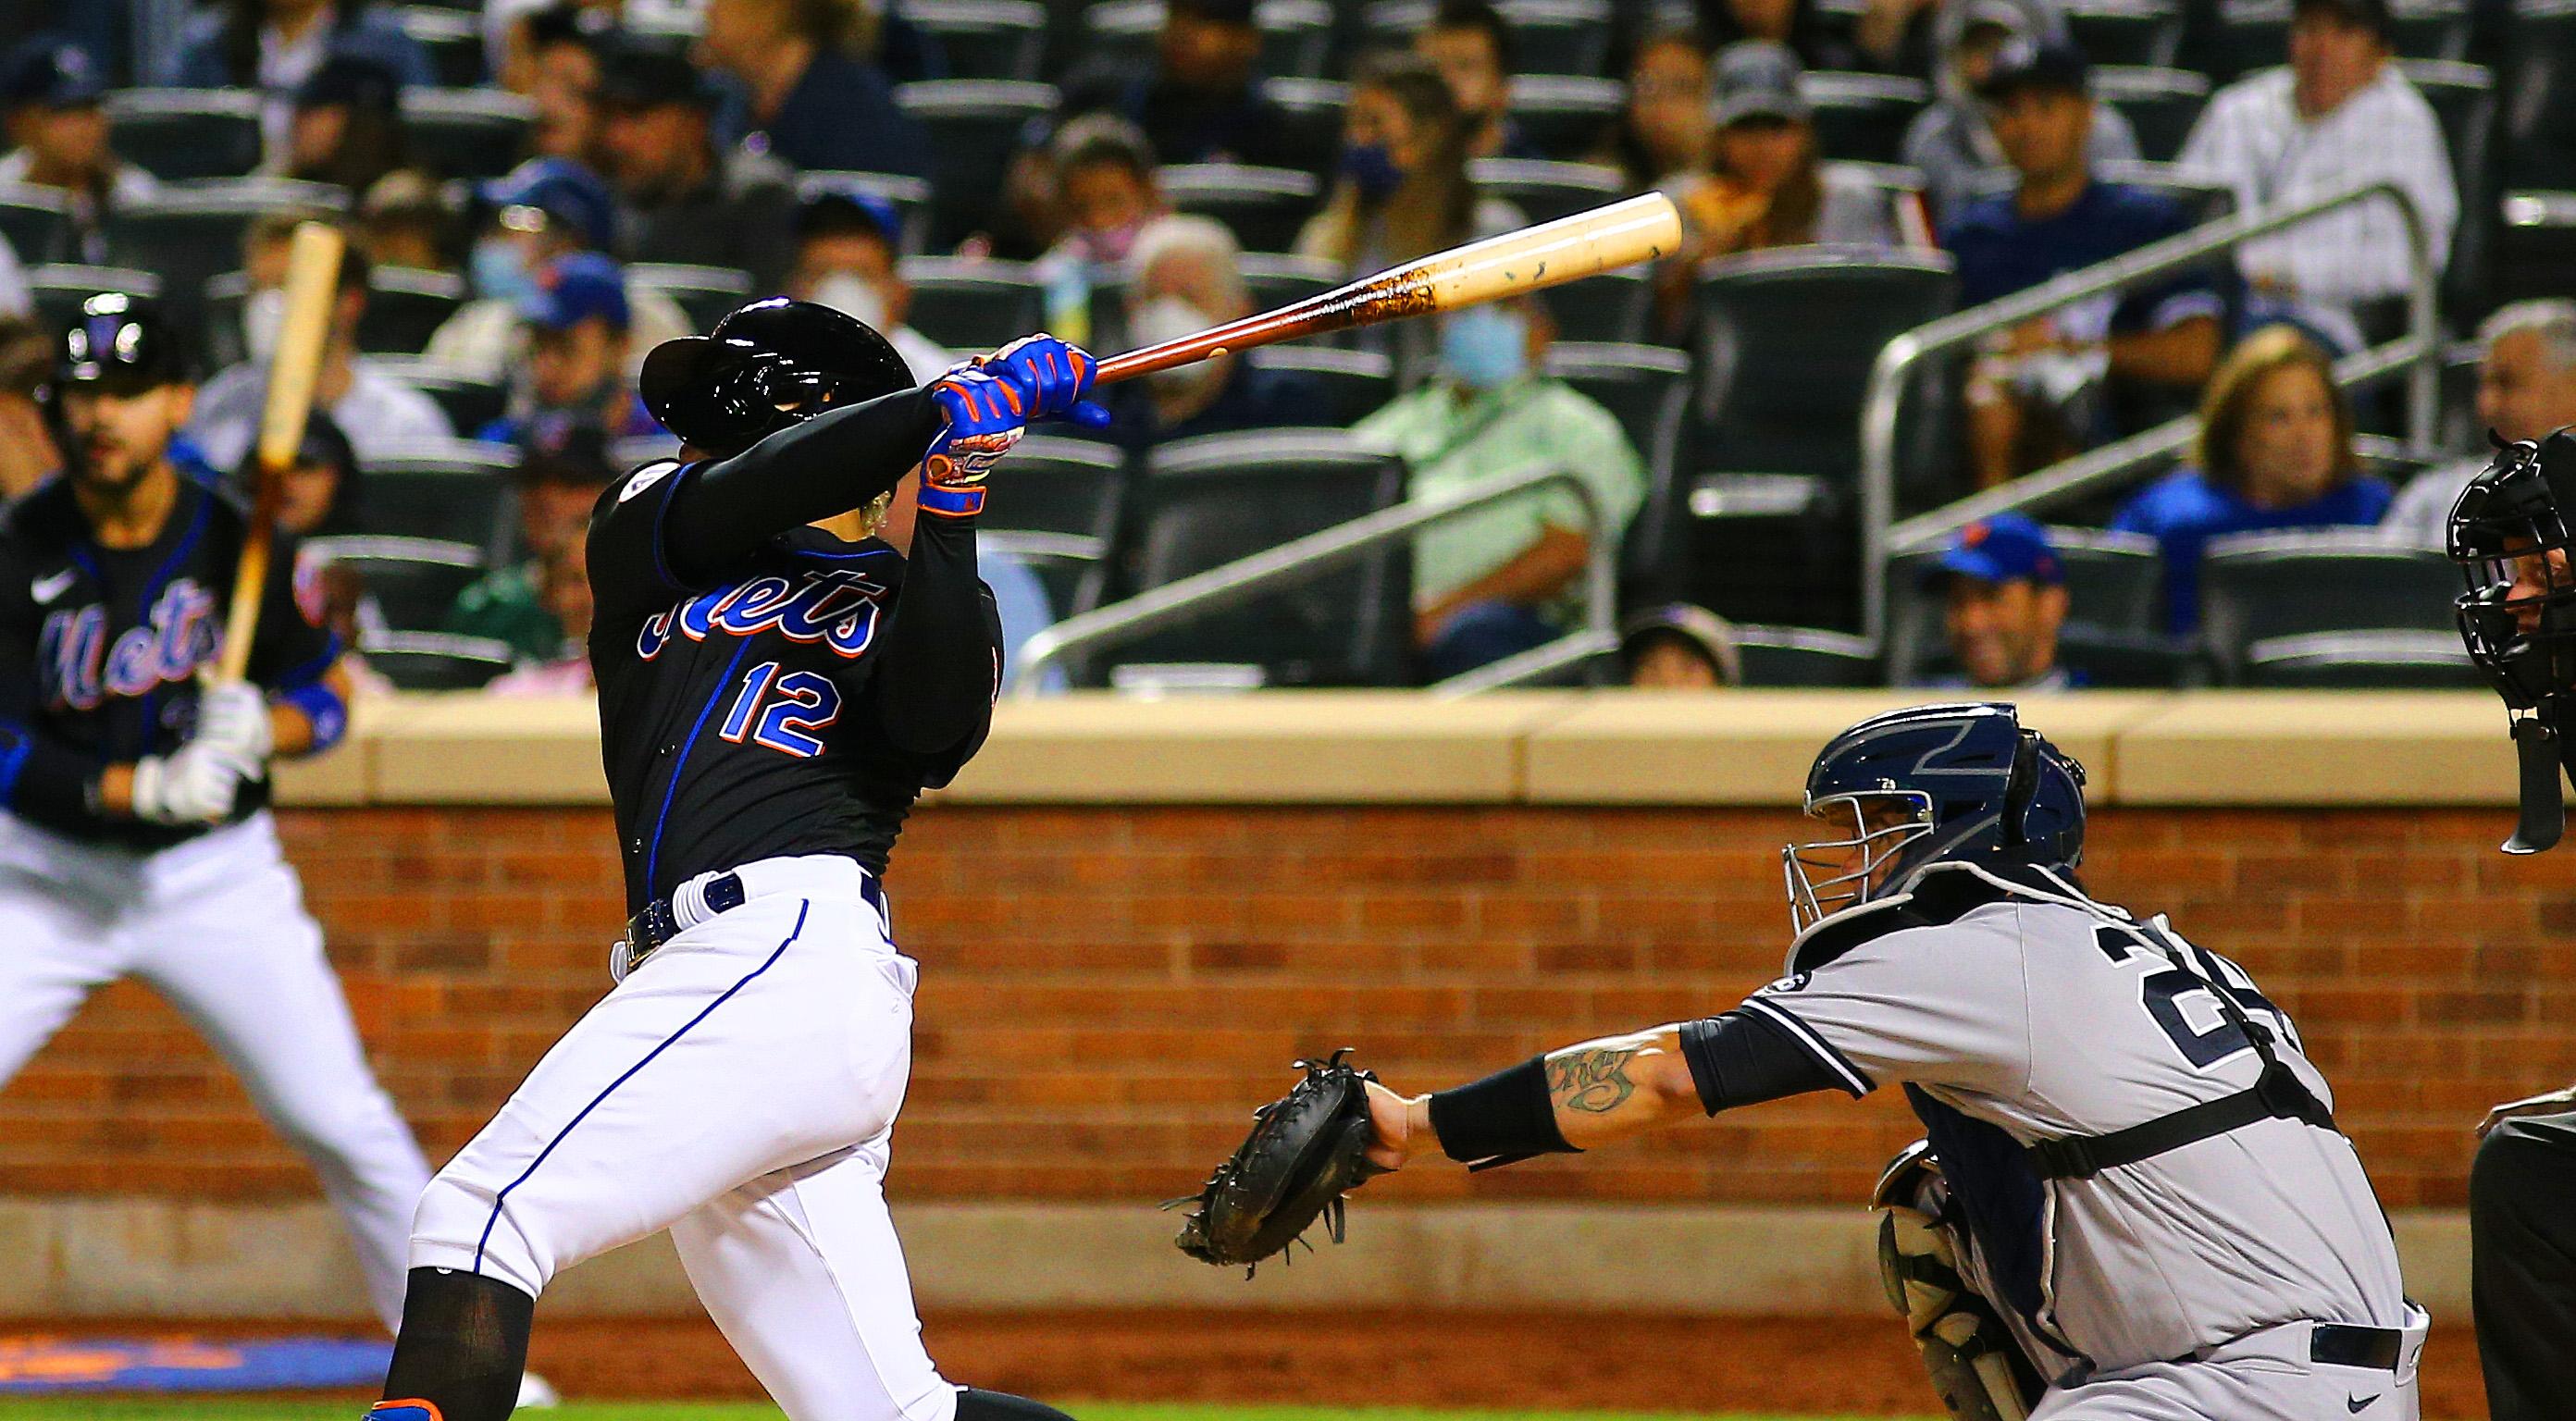 9/11/21 Game Preview: New York Yankees at New York Mets